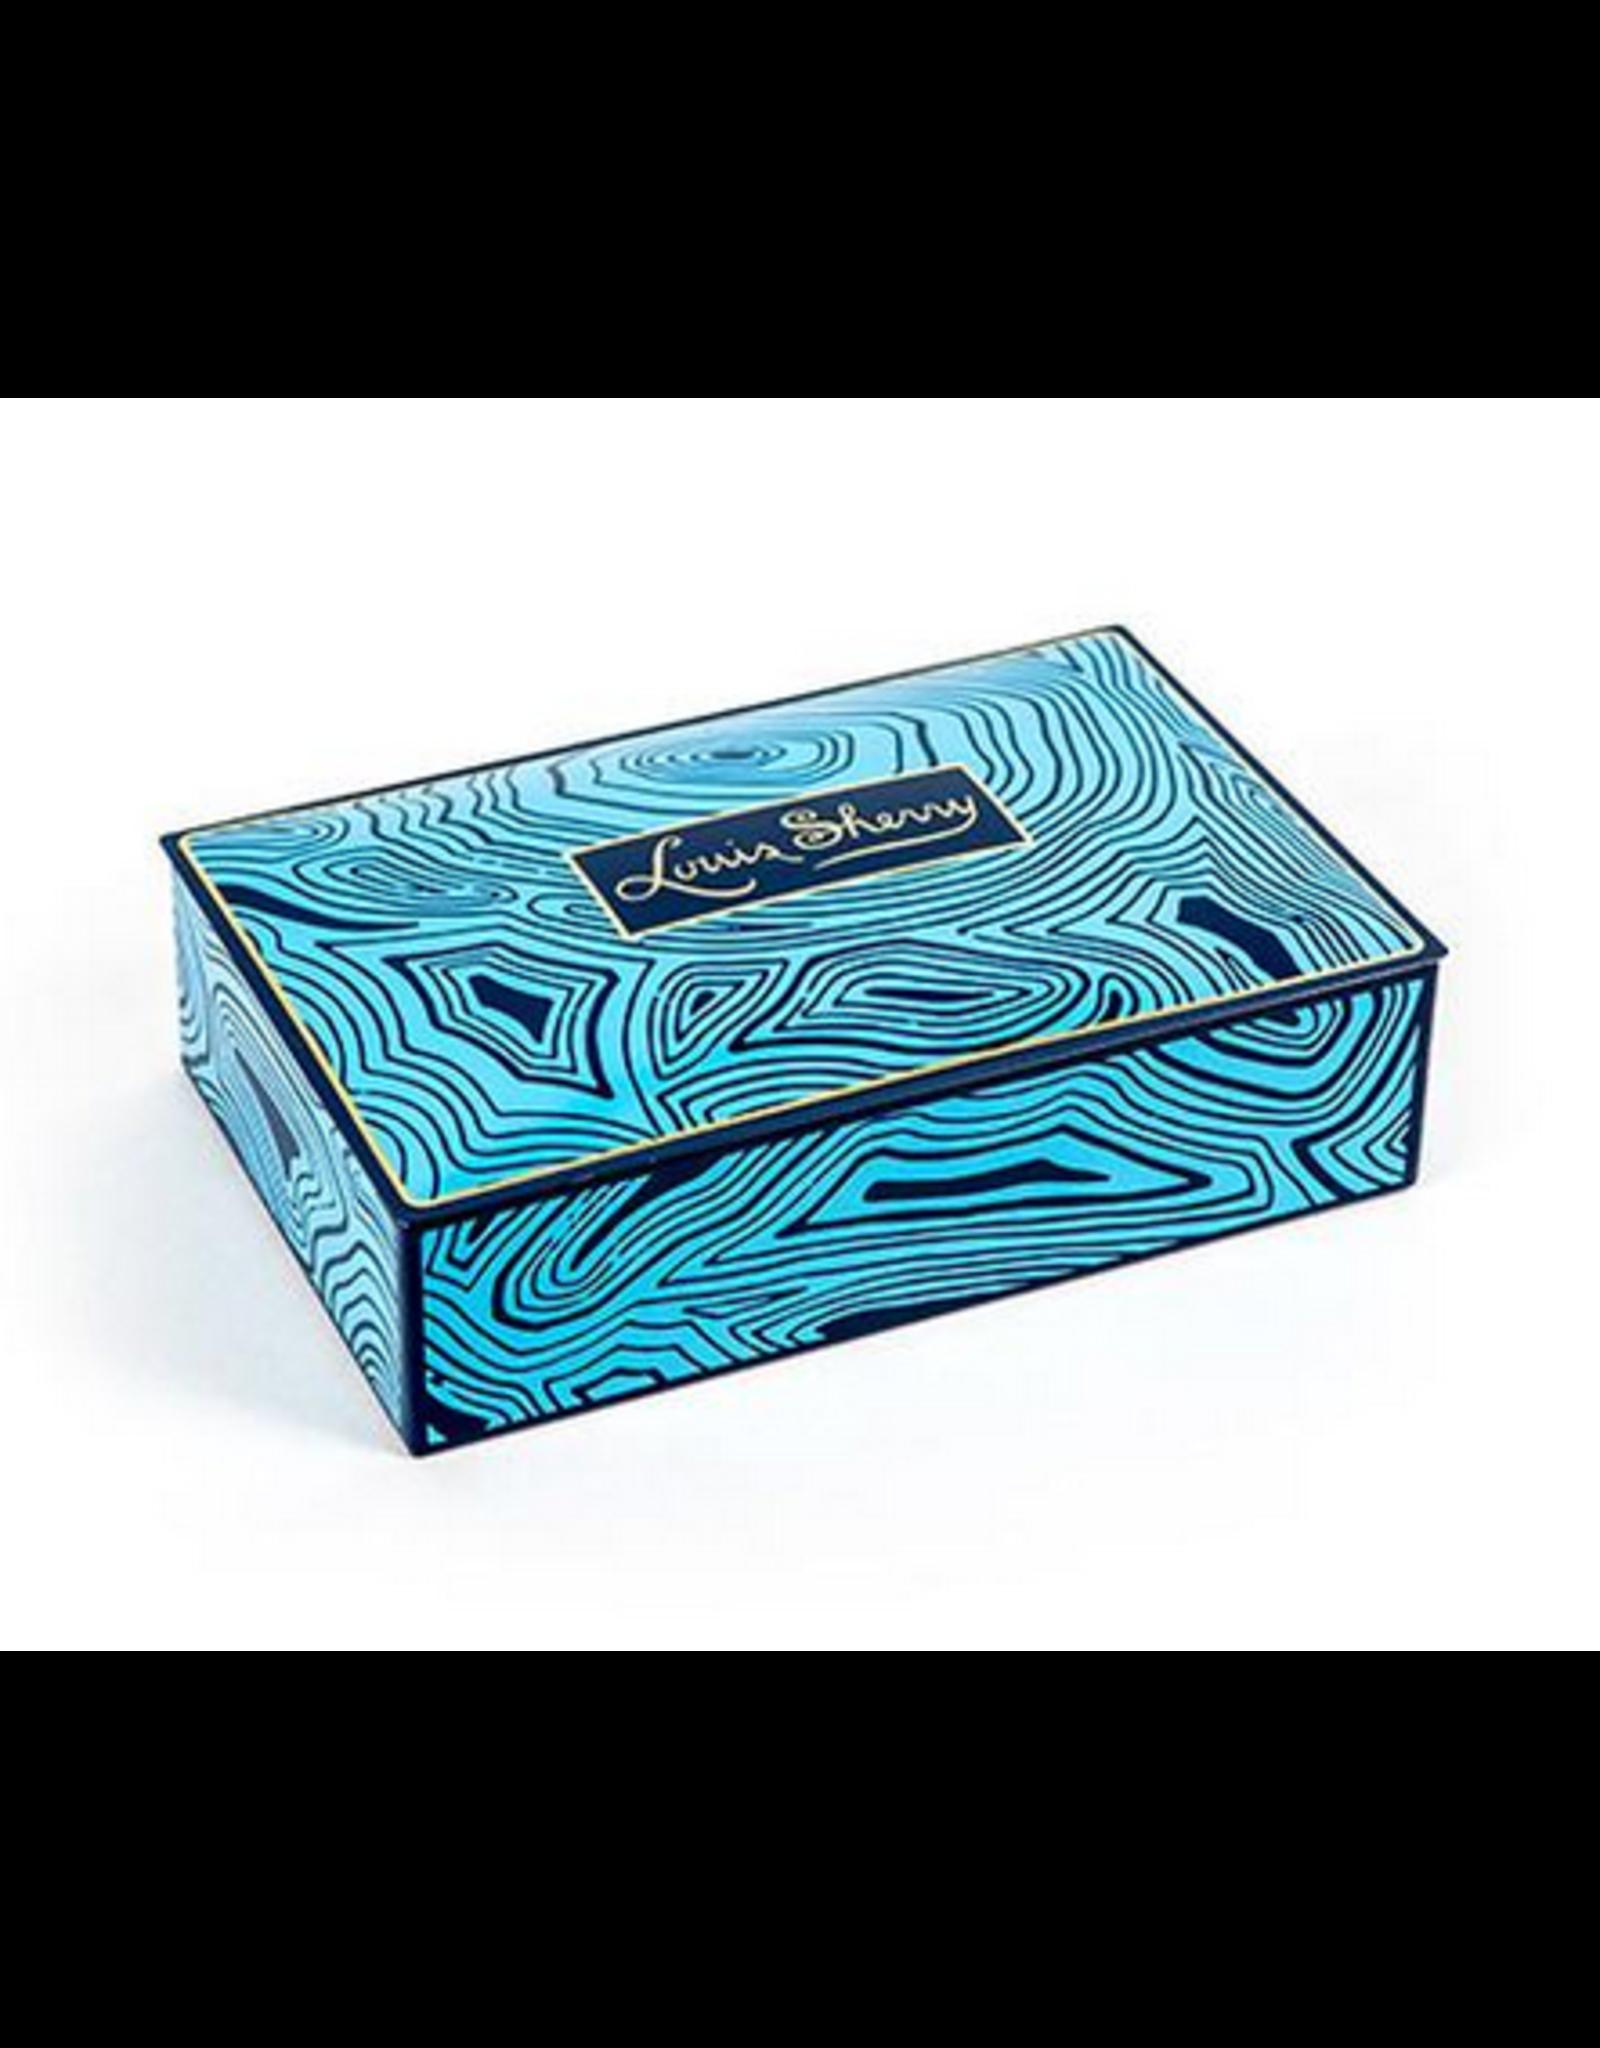 12 Piece Blue Malachite by Louis Sherry